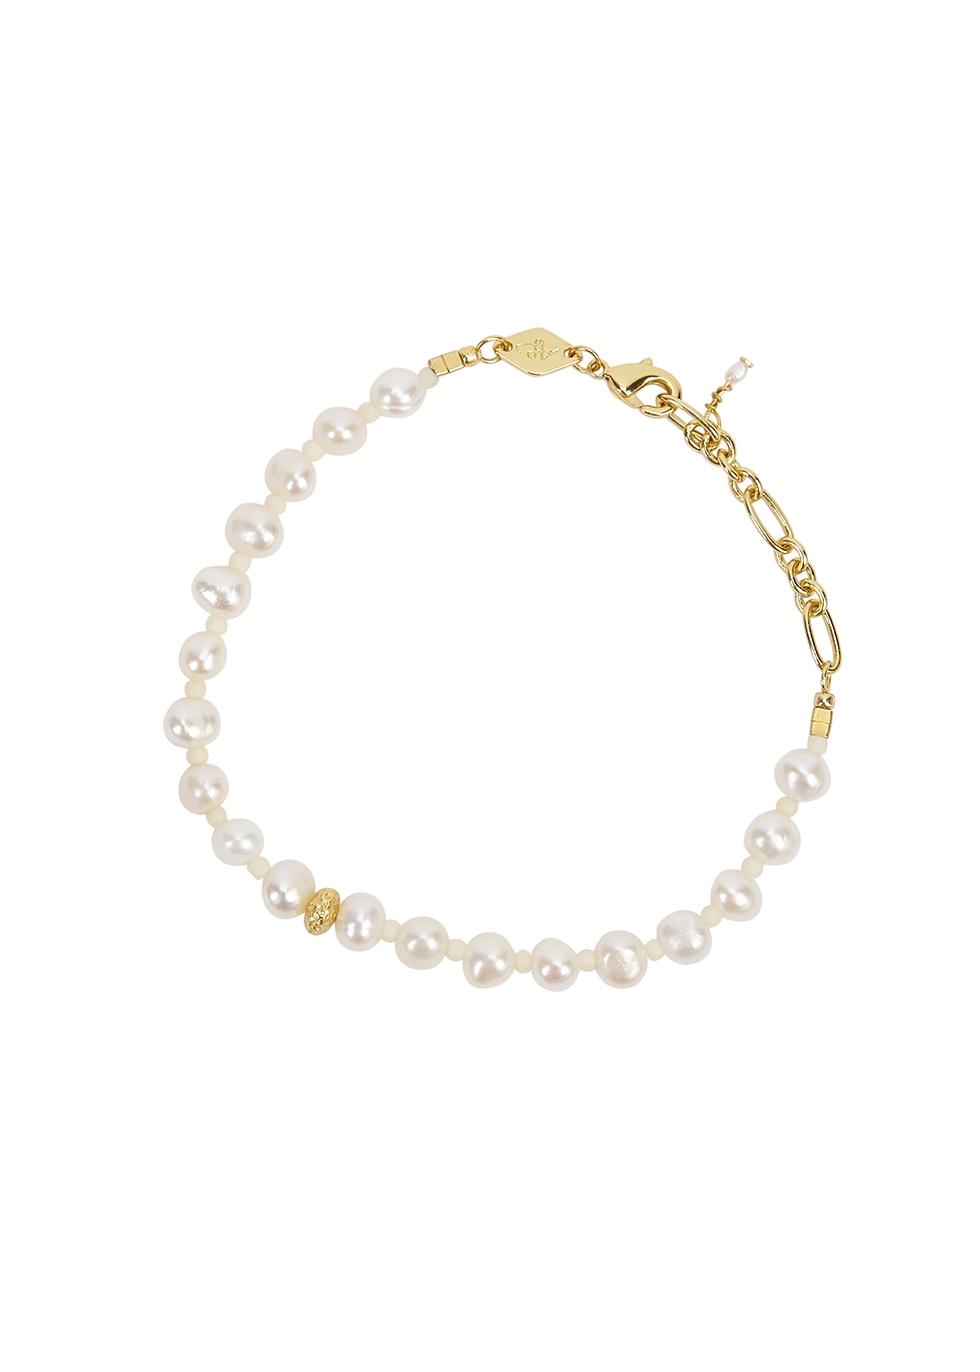 Stellar pearl bracelet